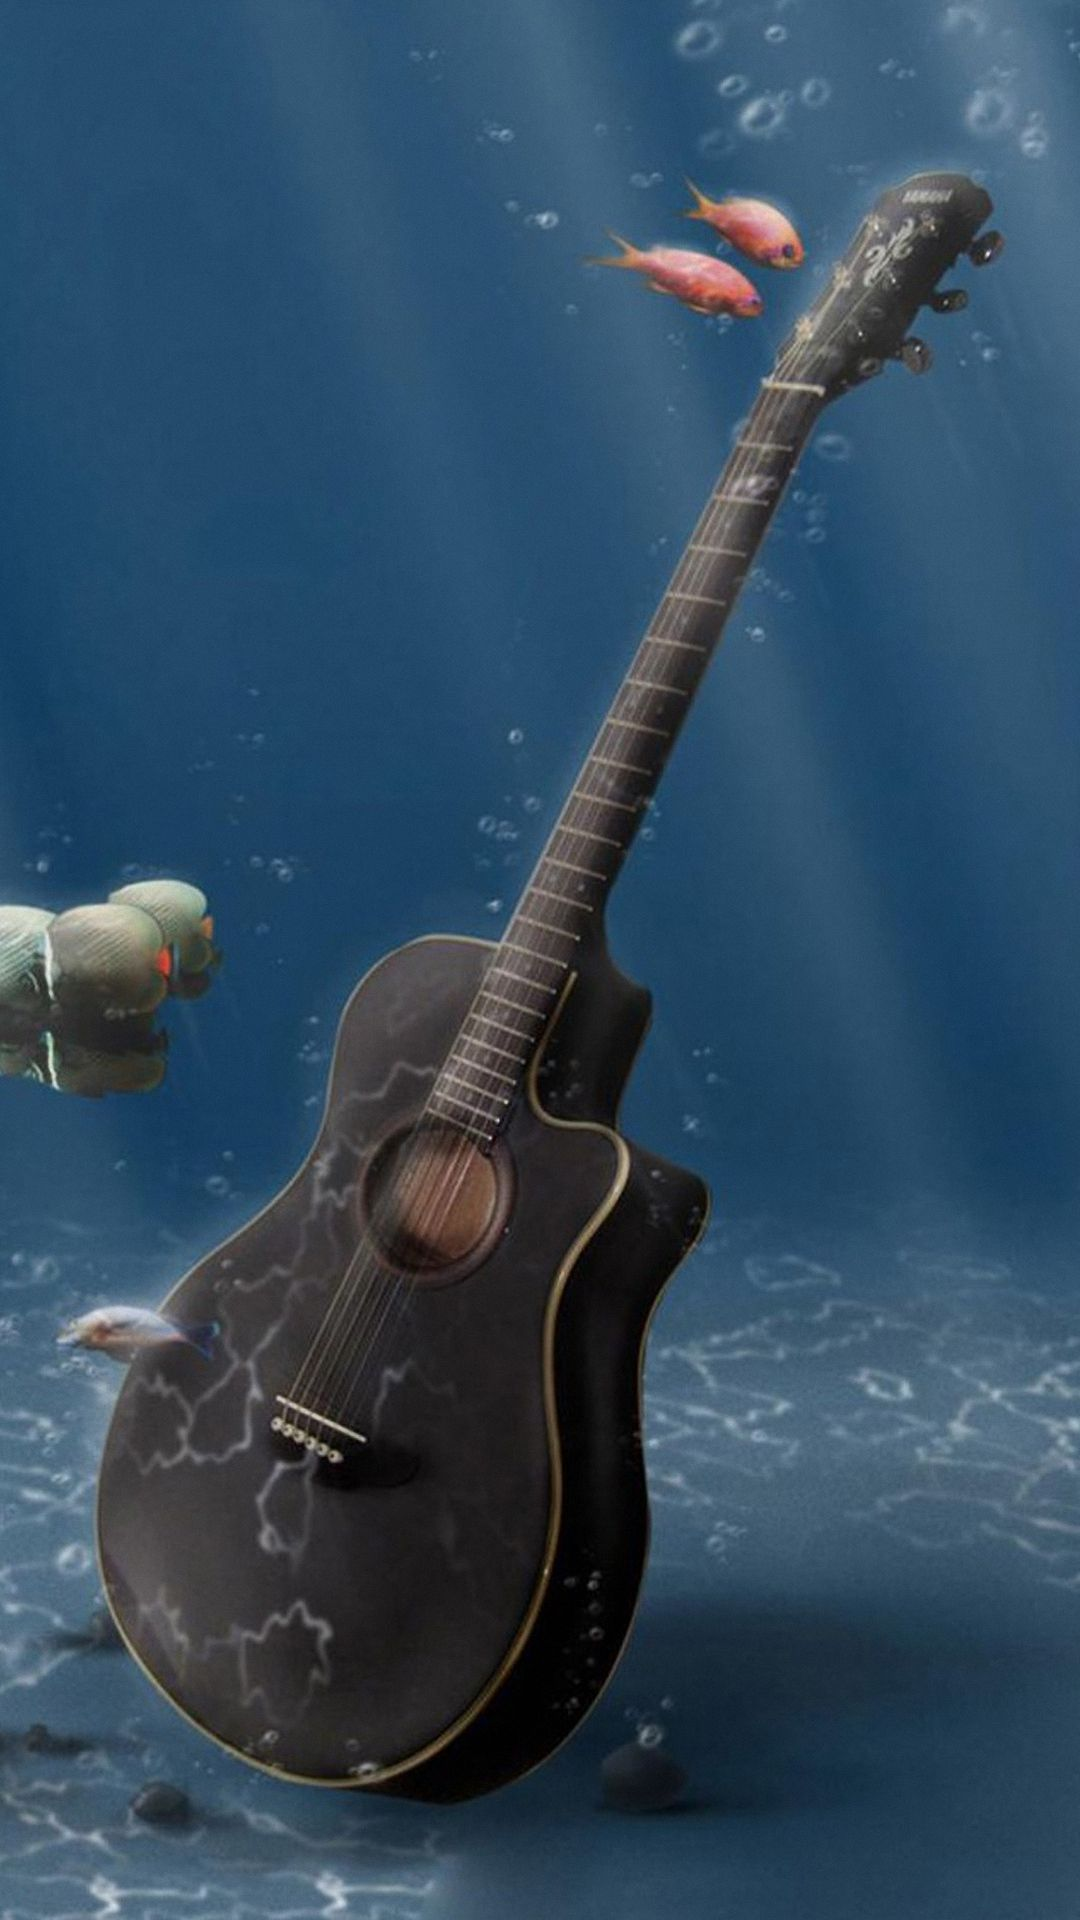 HD 1080x1920 music guitar samsung galaxy wallpaper Music